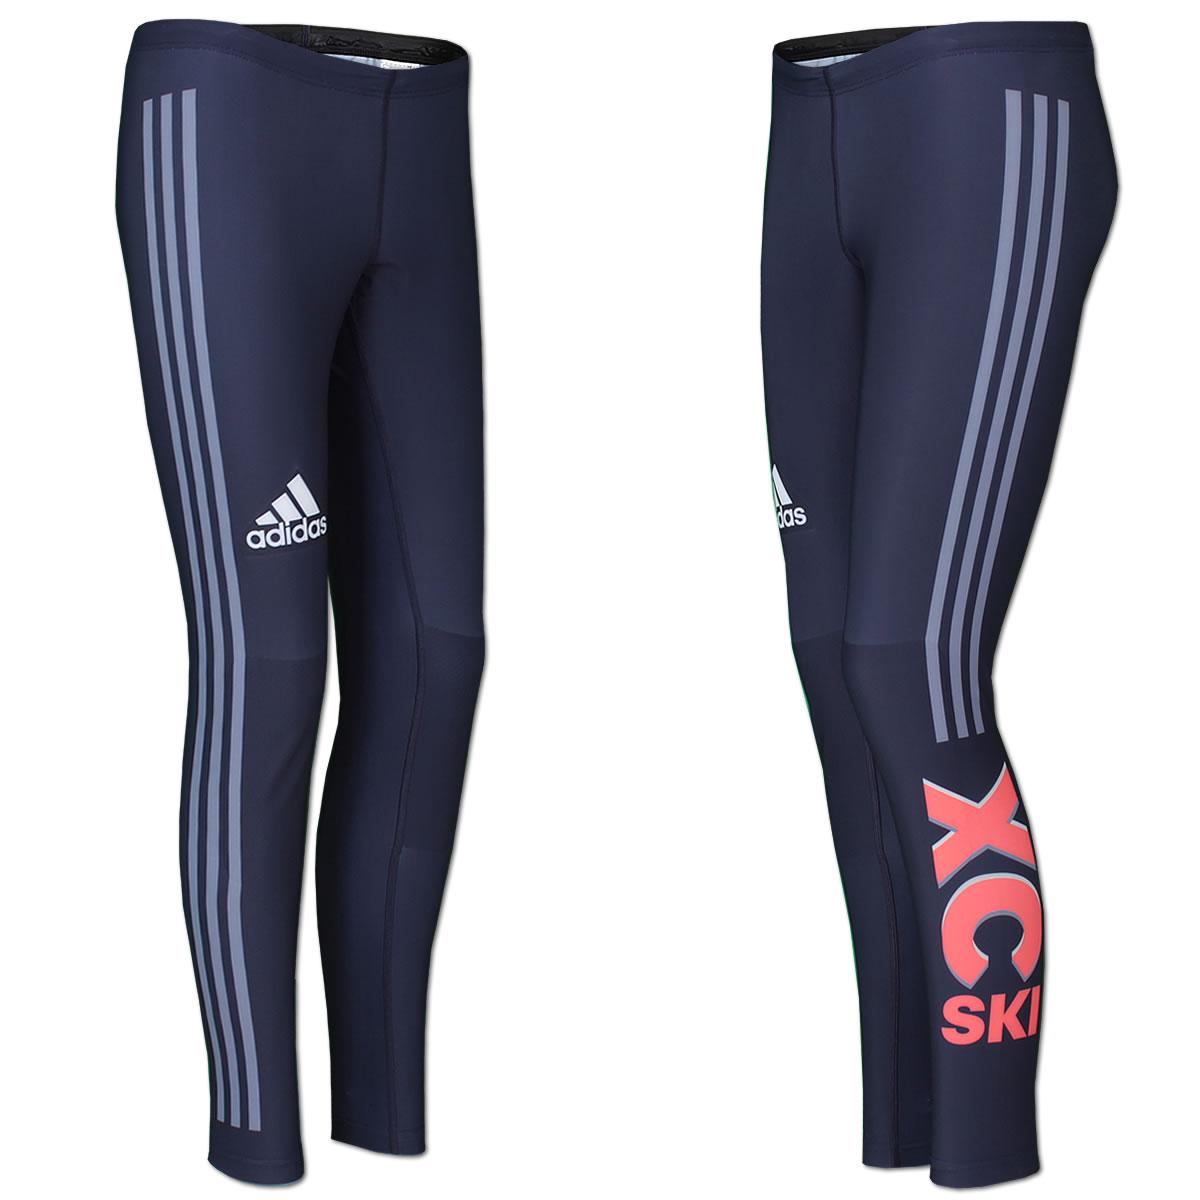 adidas Damen Race Tight 3 Streifen Laufhose Running Hose XC